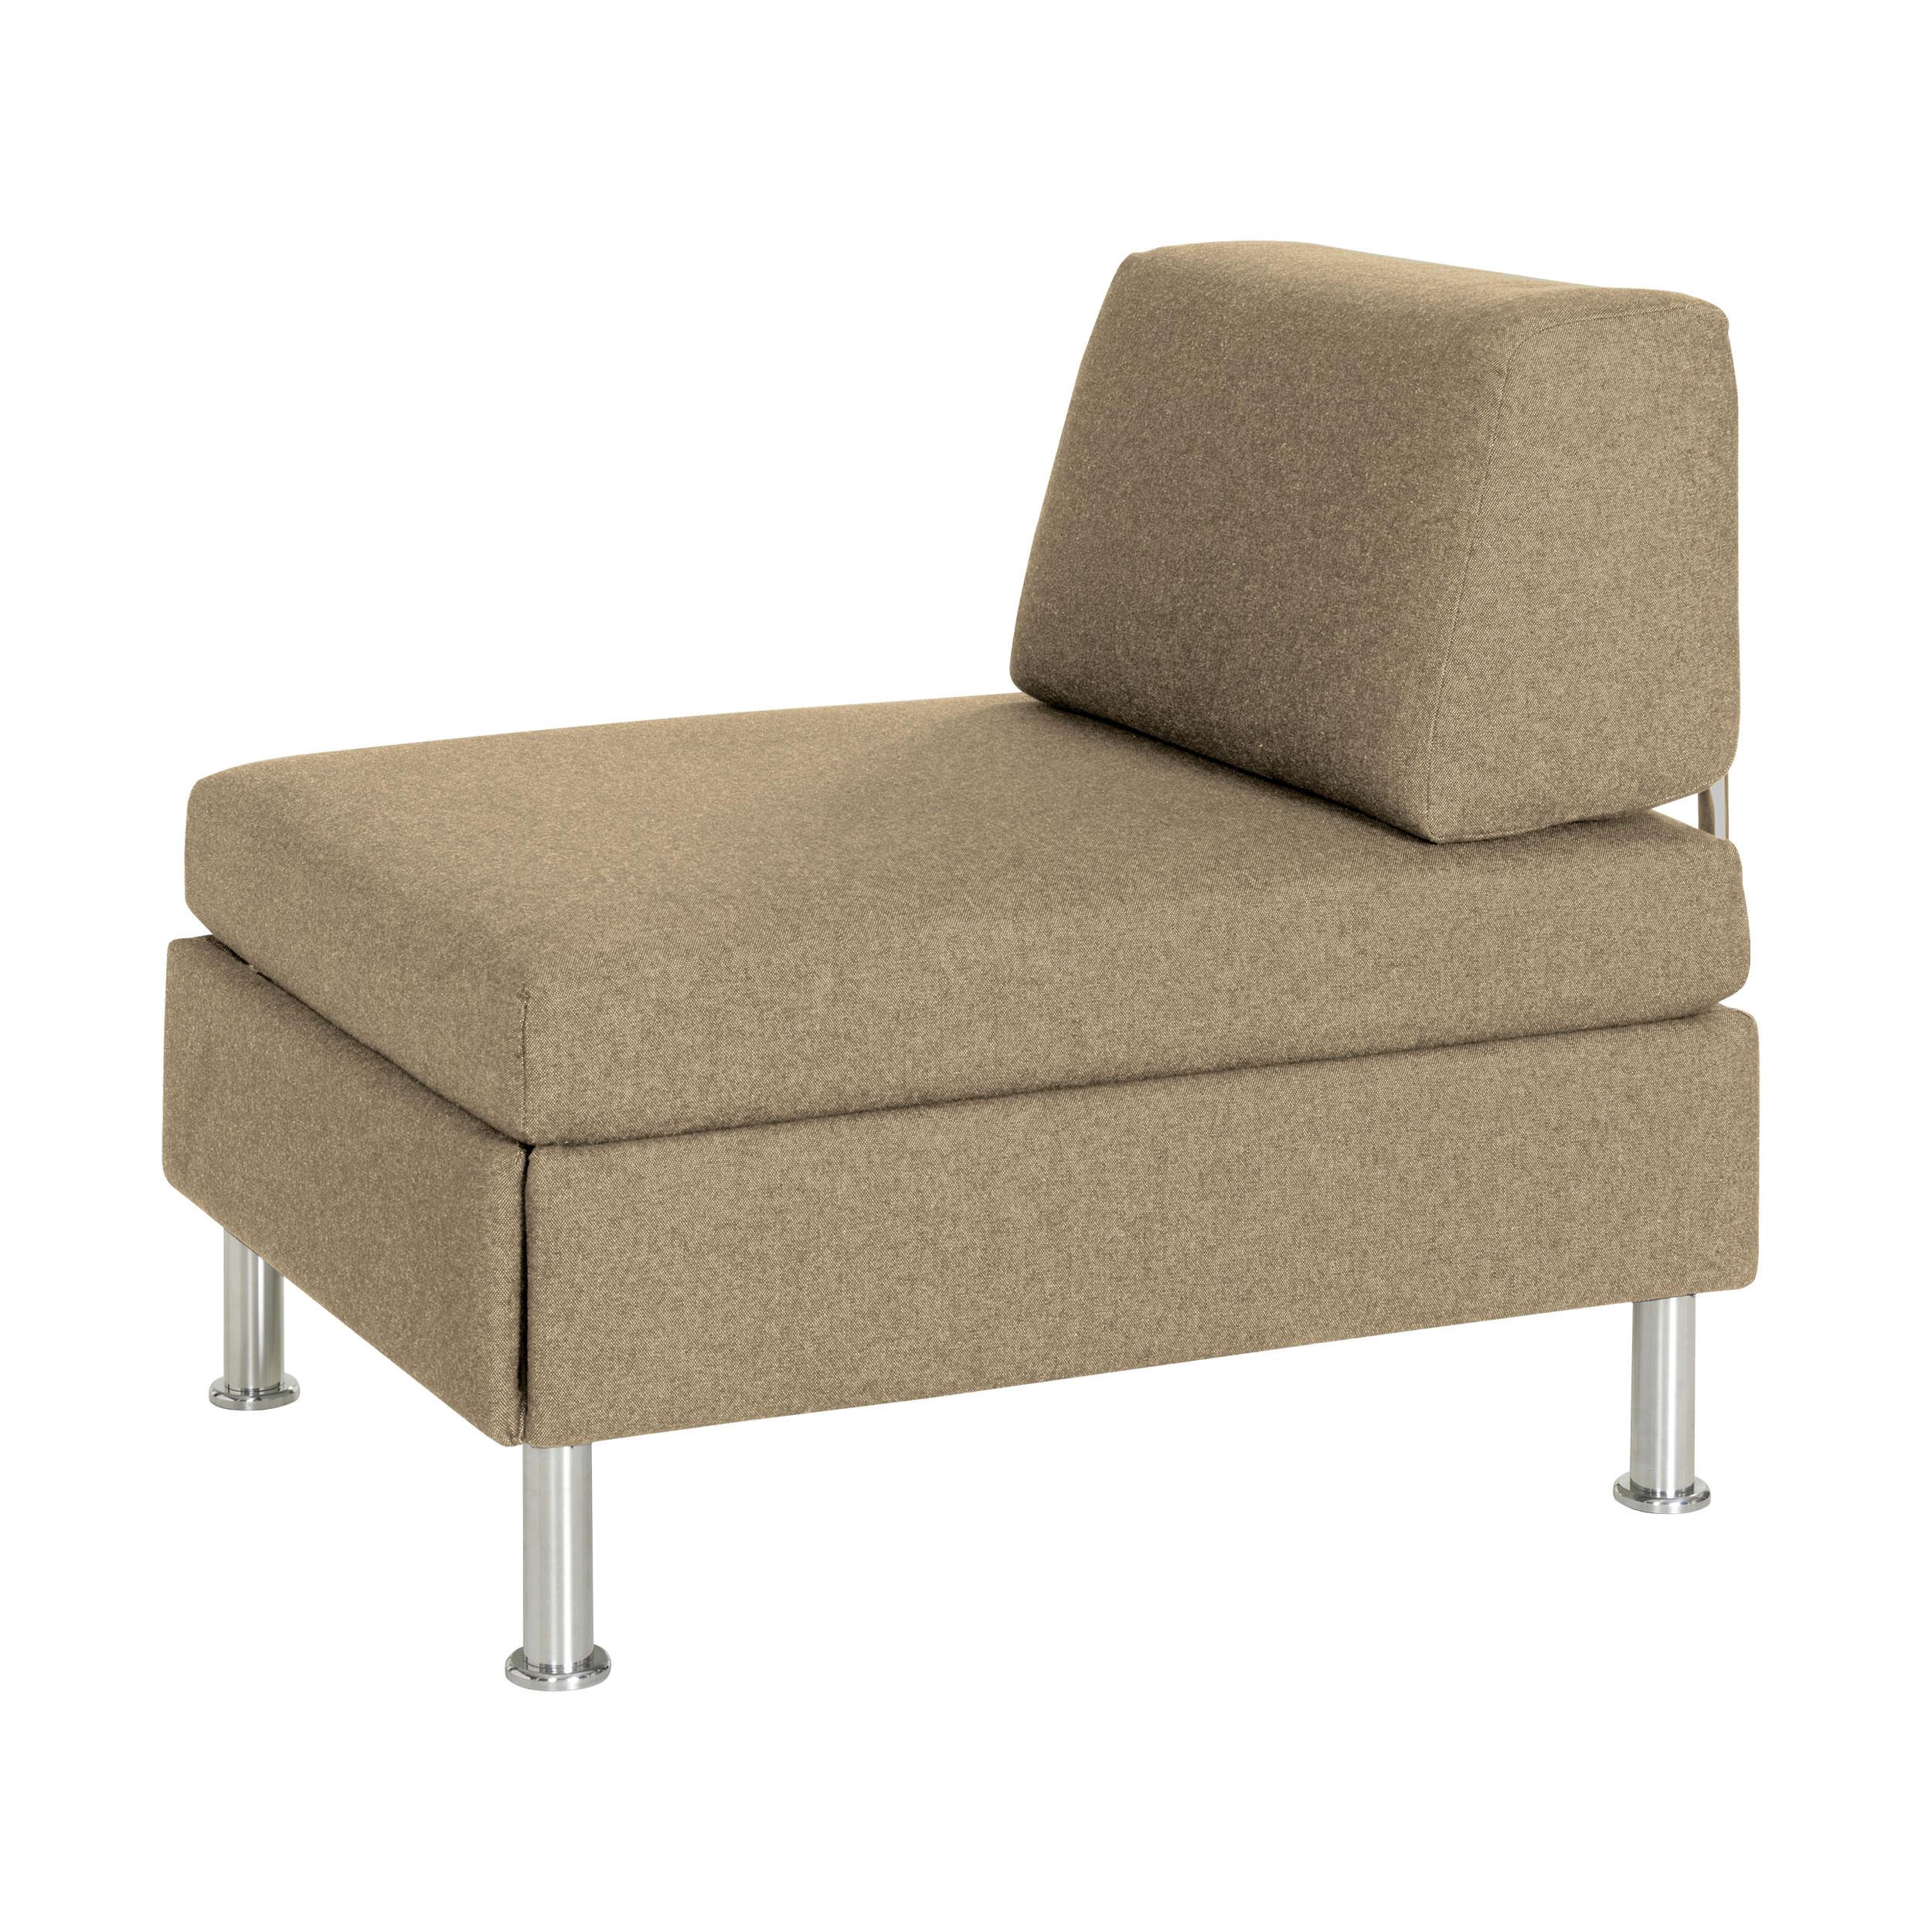 bed for living function hocker mit schublade sand online kaufen bei woonio. Black Bedroom Furniture Sets. Home Design Ideas